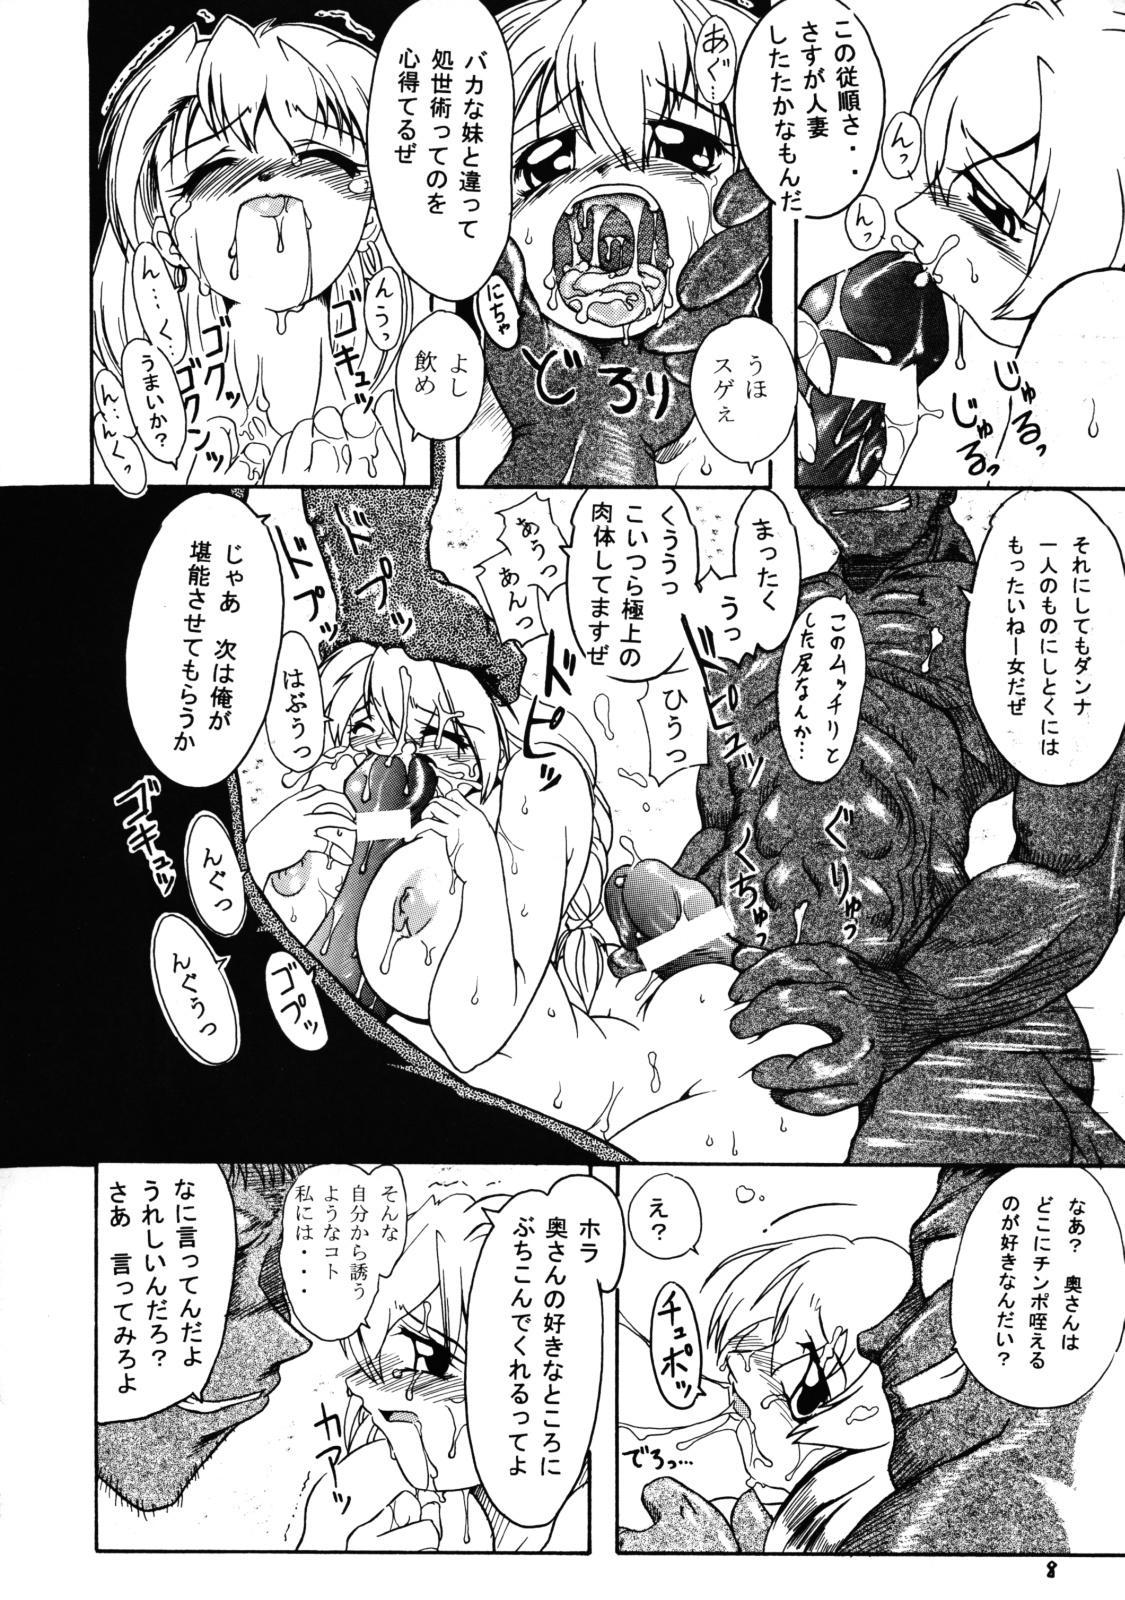 Kakugee Sanmai 3 6